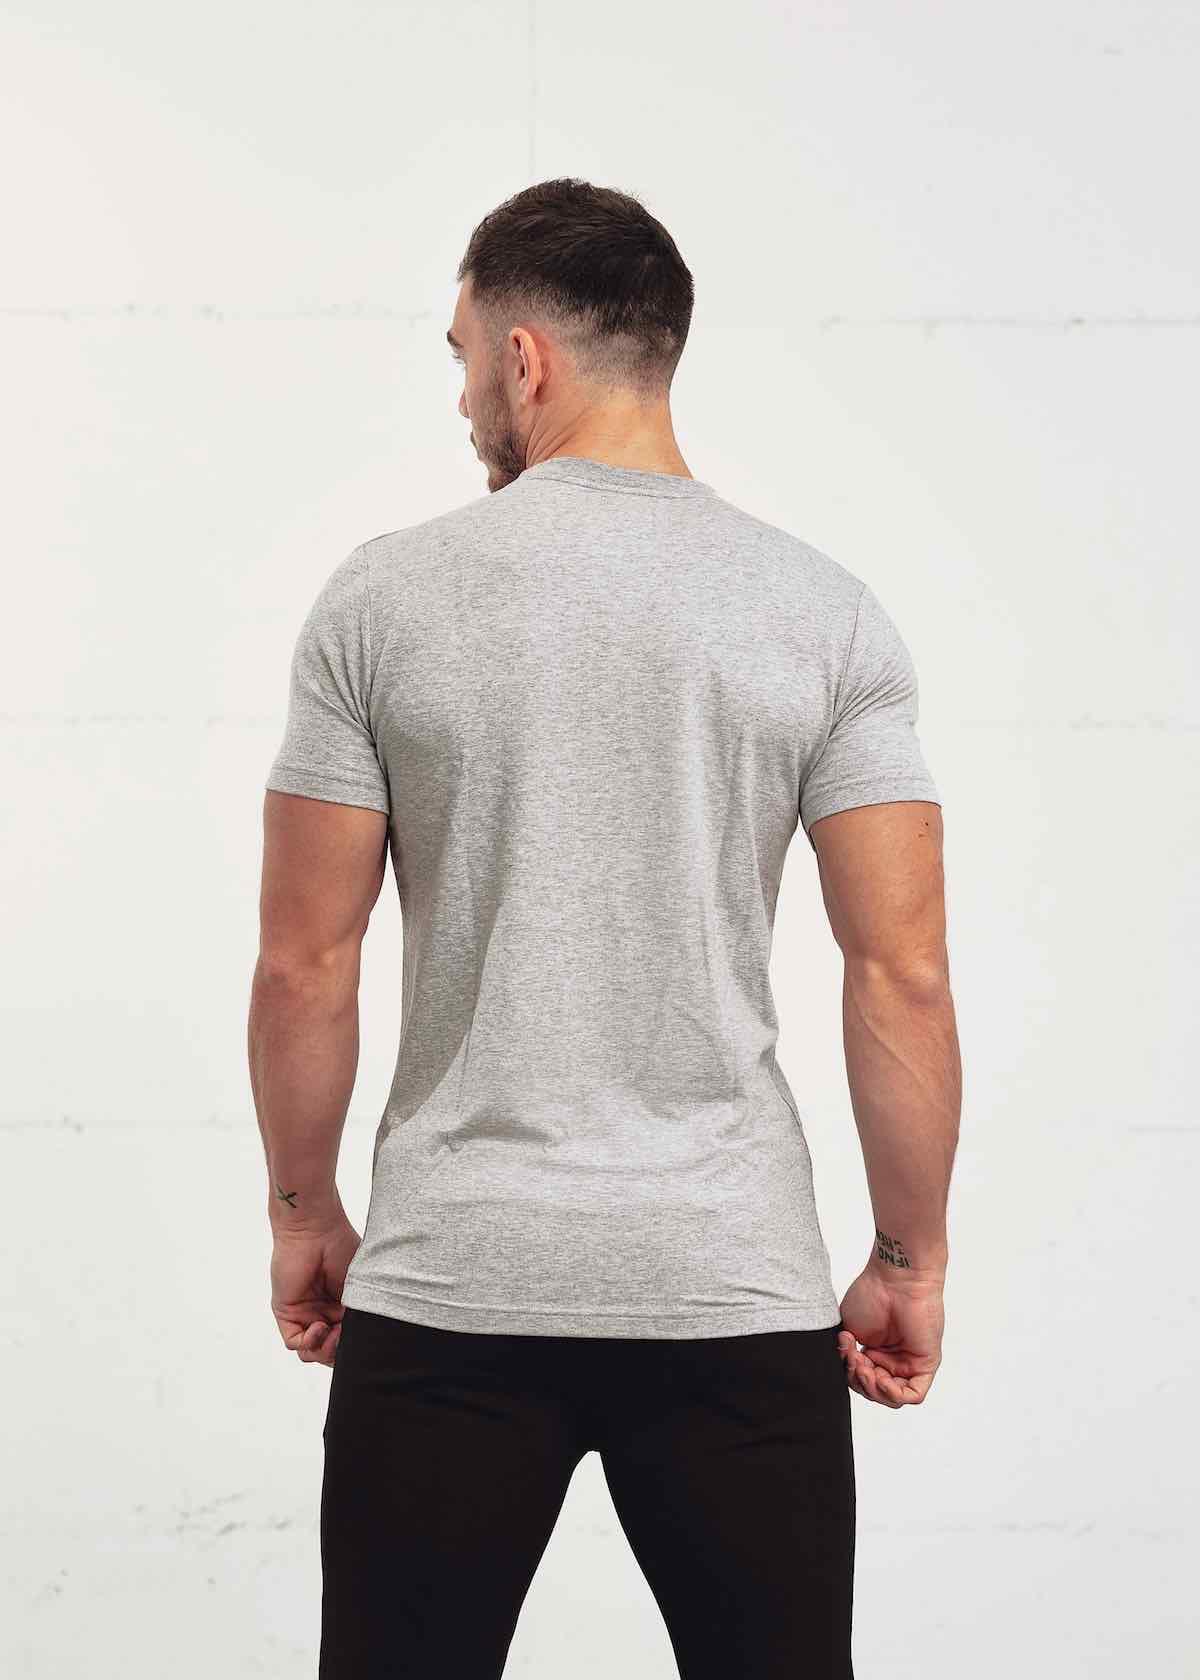 pm 21 grey tshirt back